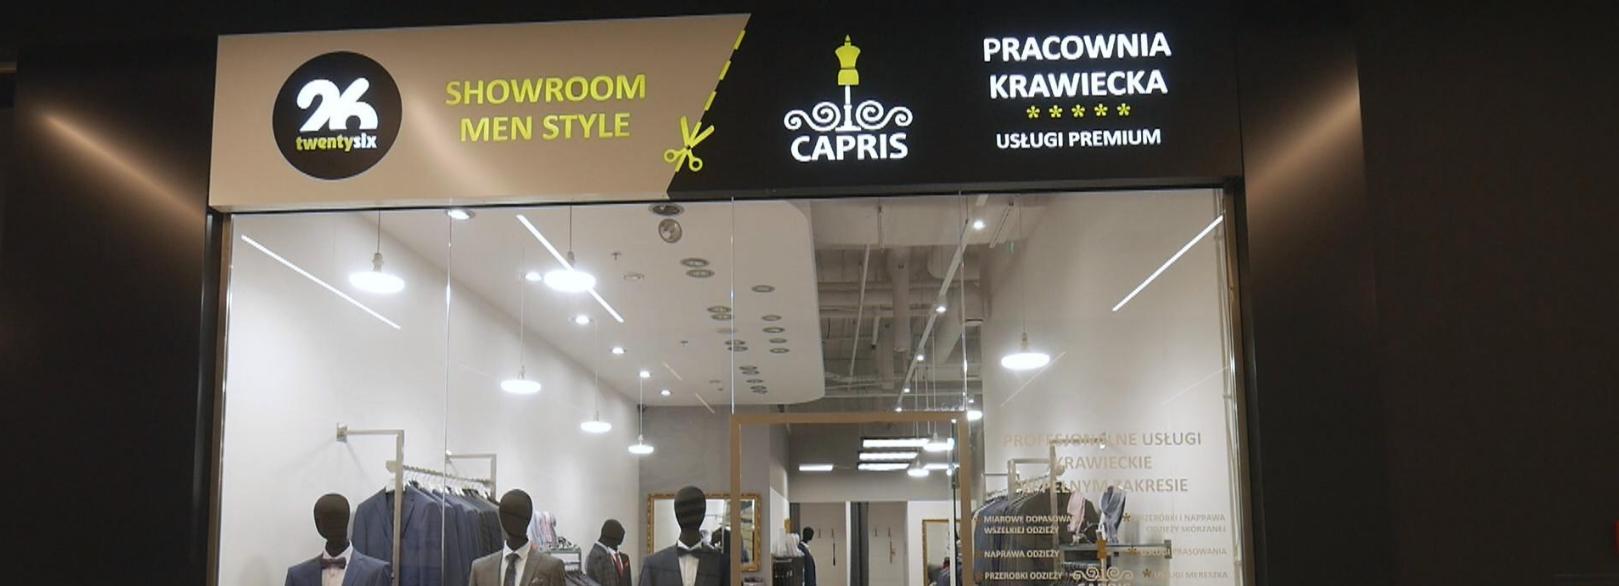 Capris Pracownia Krawiecka Premium & Showroom Men Style TwentySix